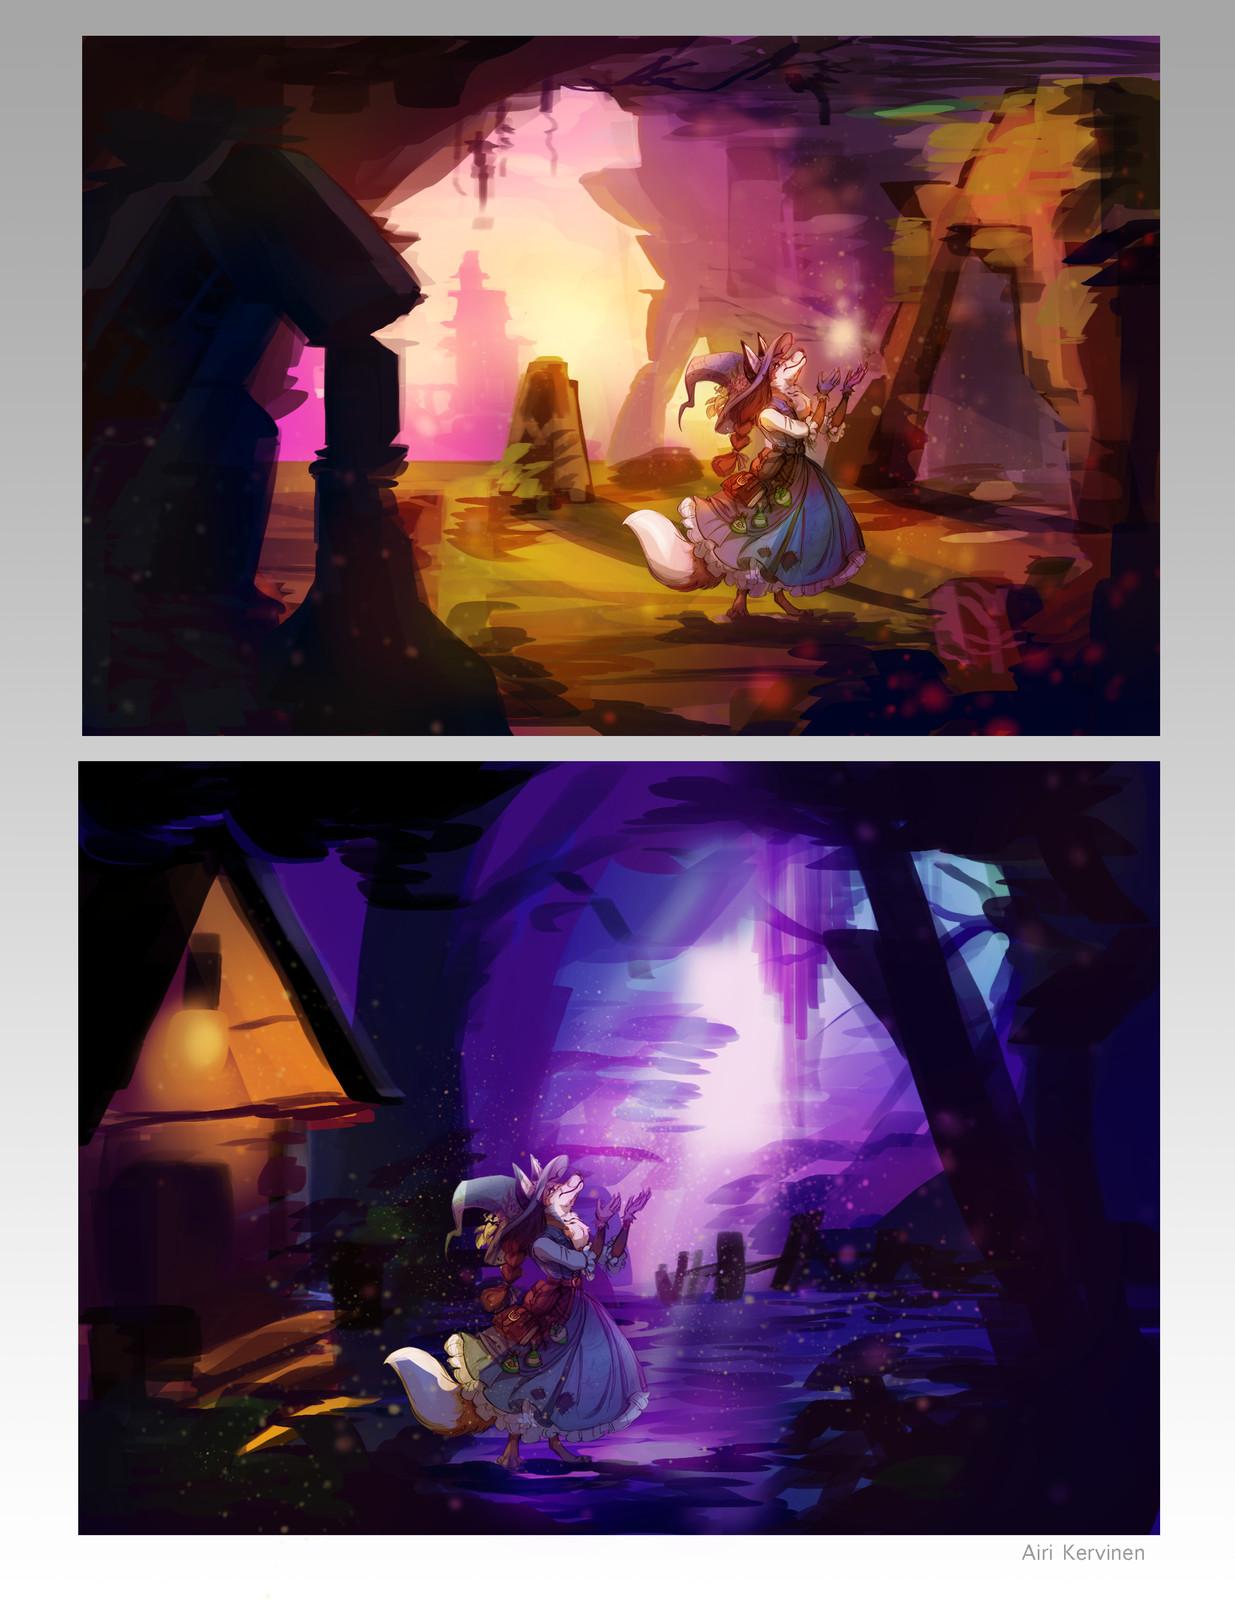 Thumbnails 5-6